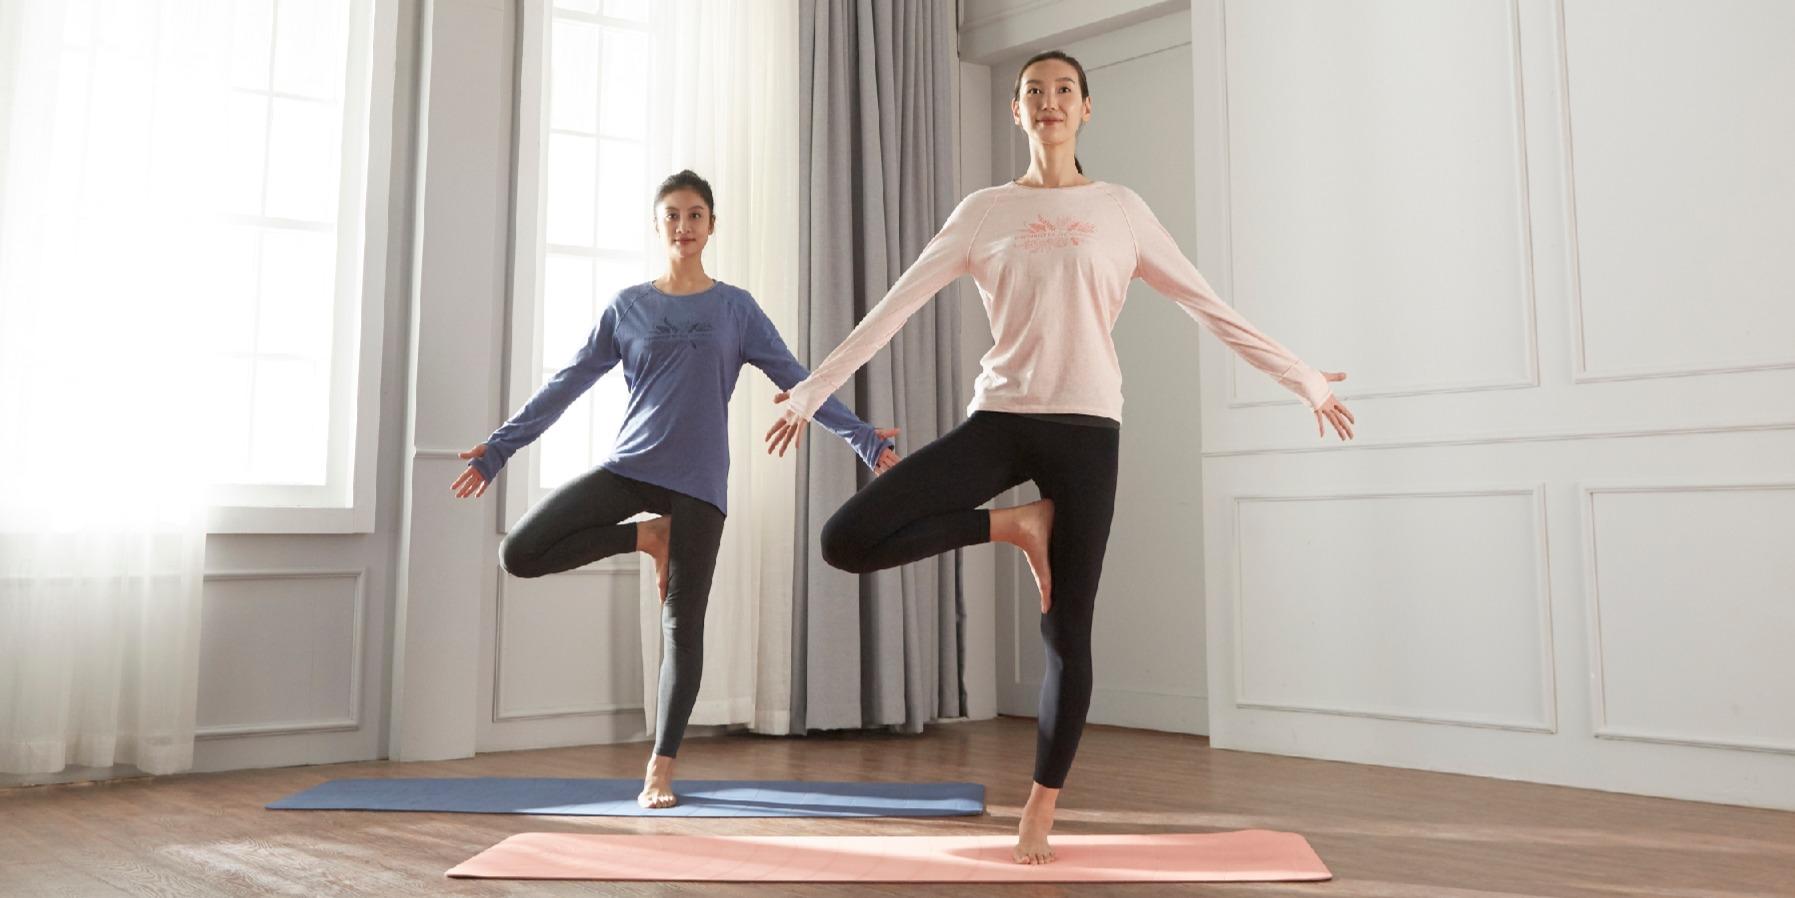 Domyos Ts Ml Yoga F Doux Corail - 000 --- Expires On 30-12-2028_resize_78.jpg